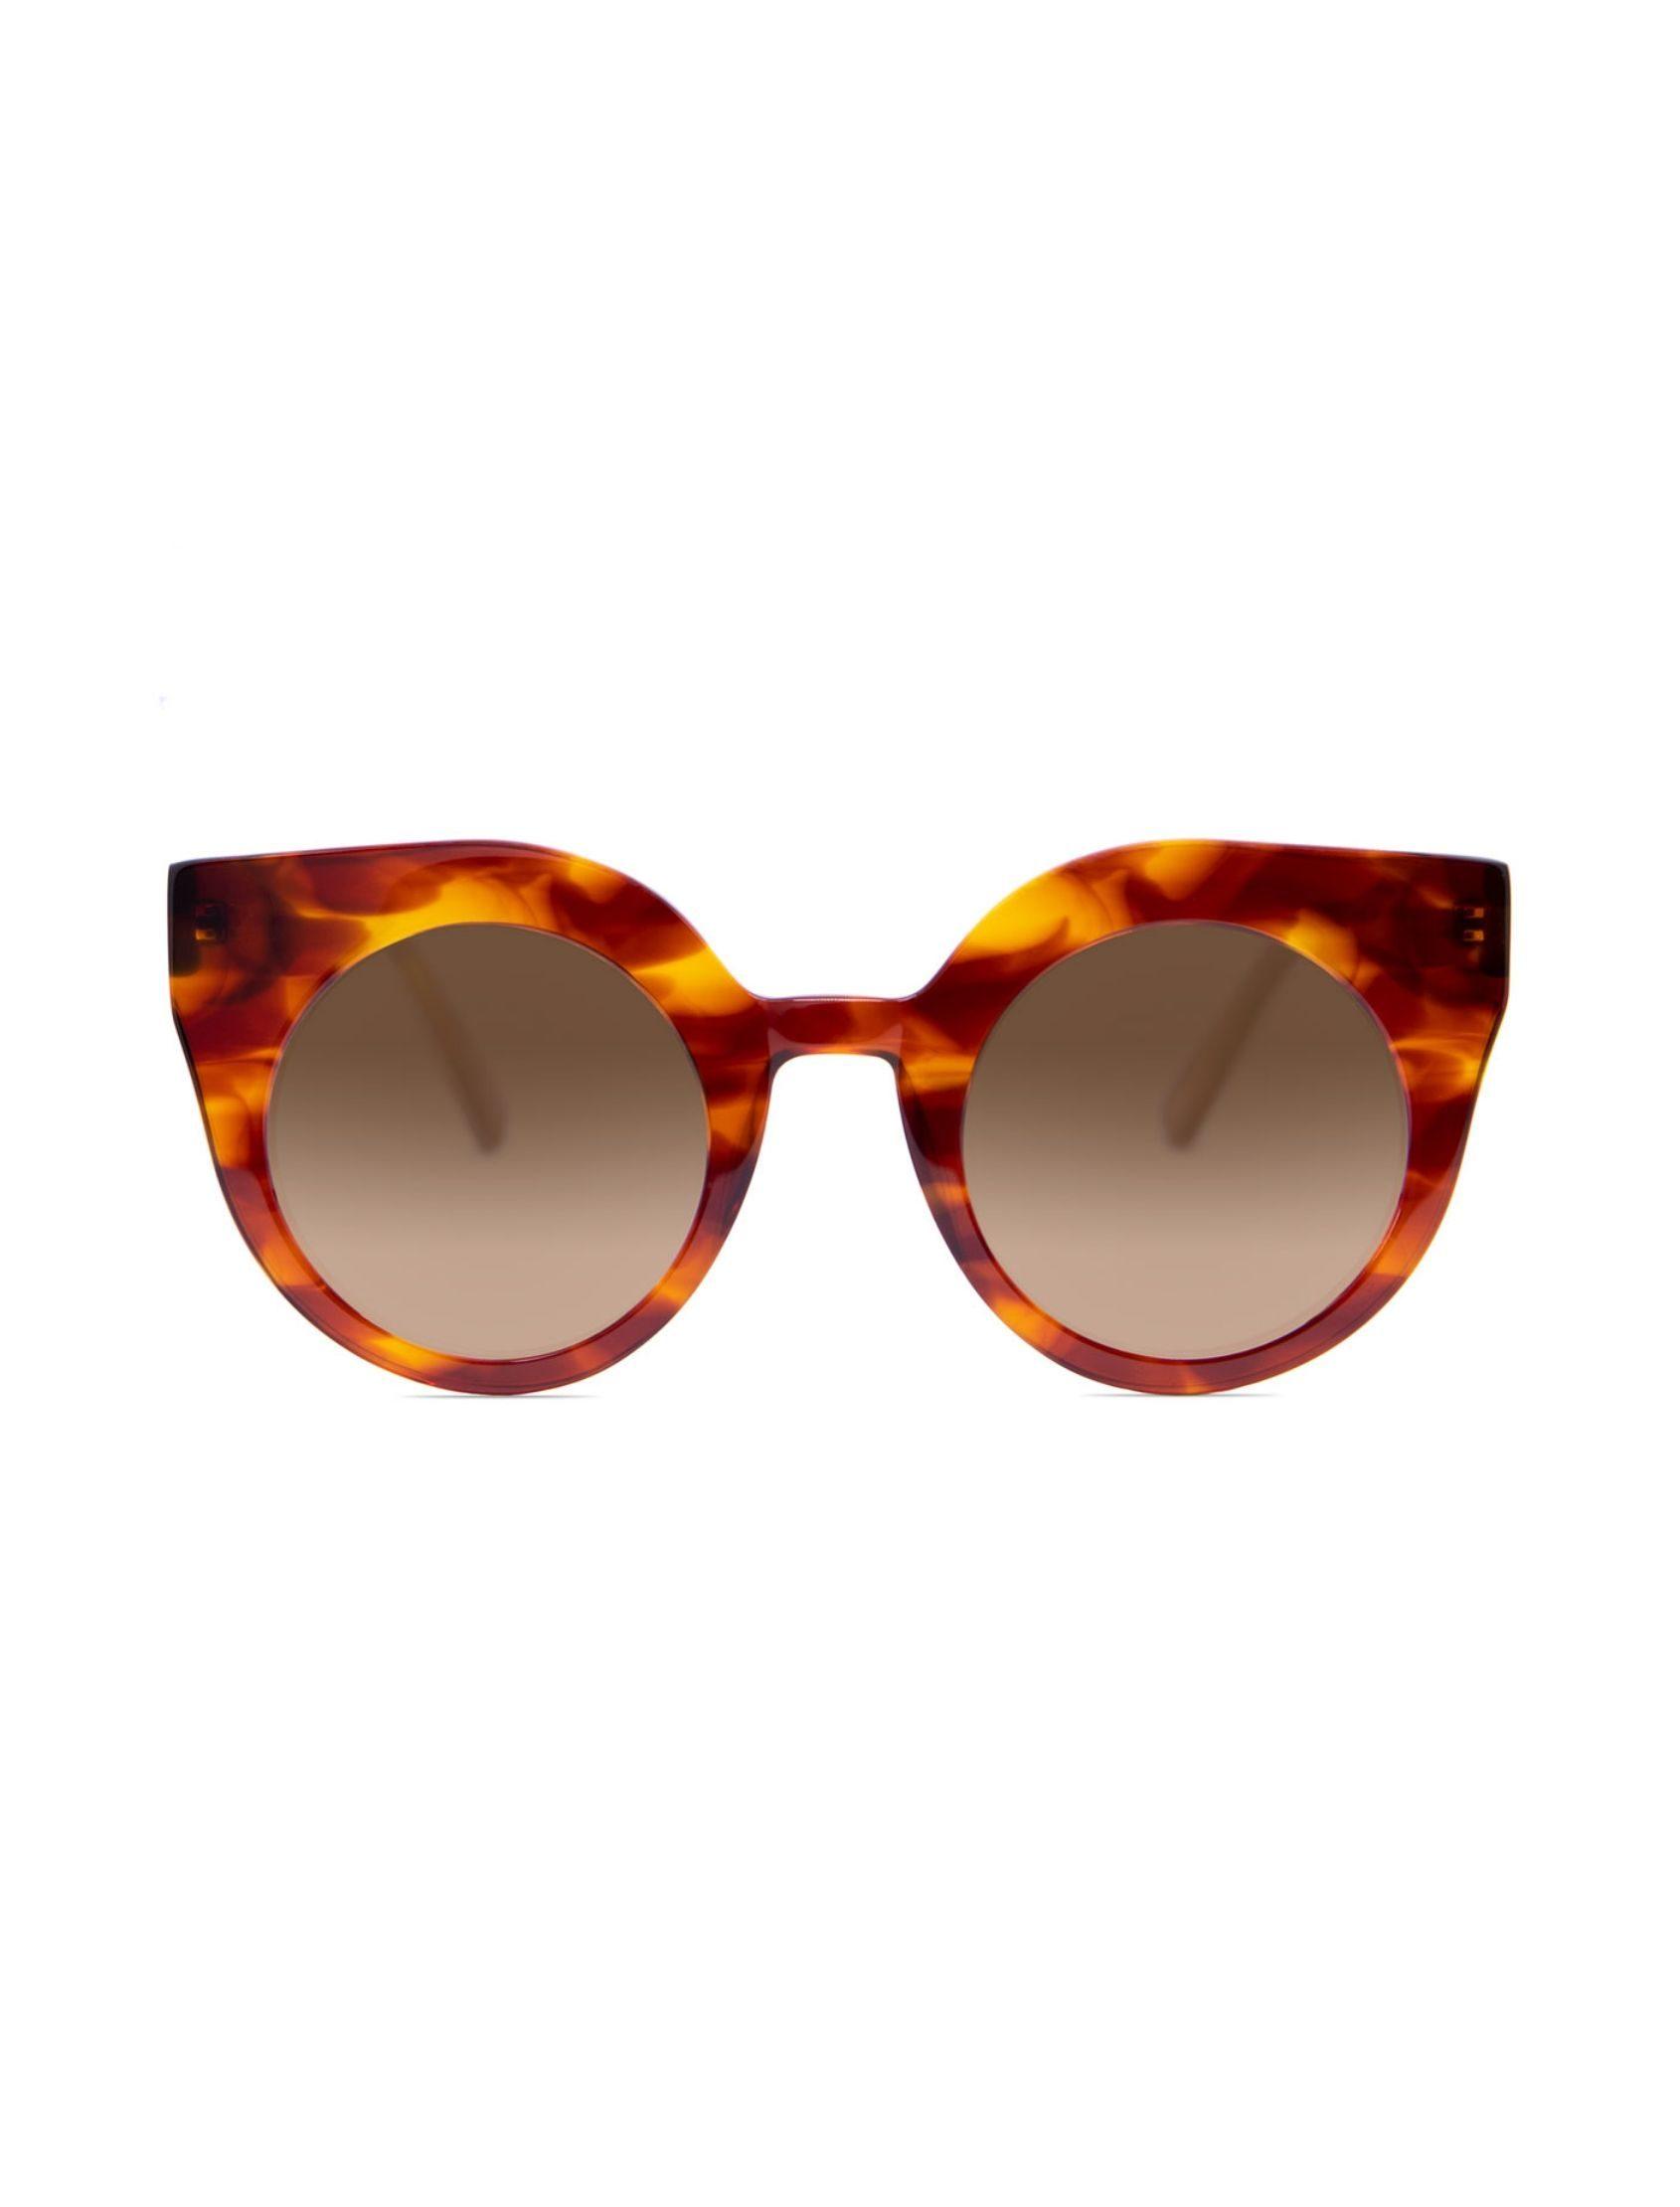 gafa de sol nina oxydian de mujer con forma de ojo de gato redondeada